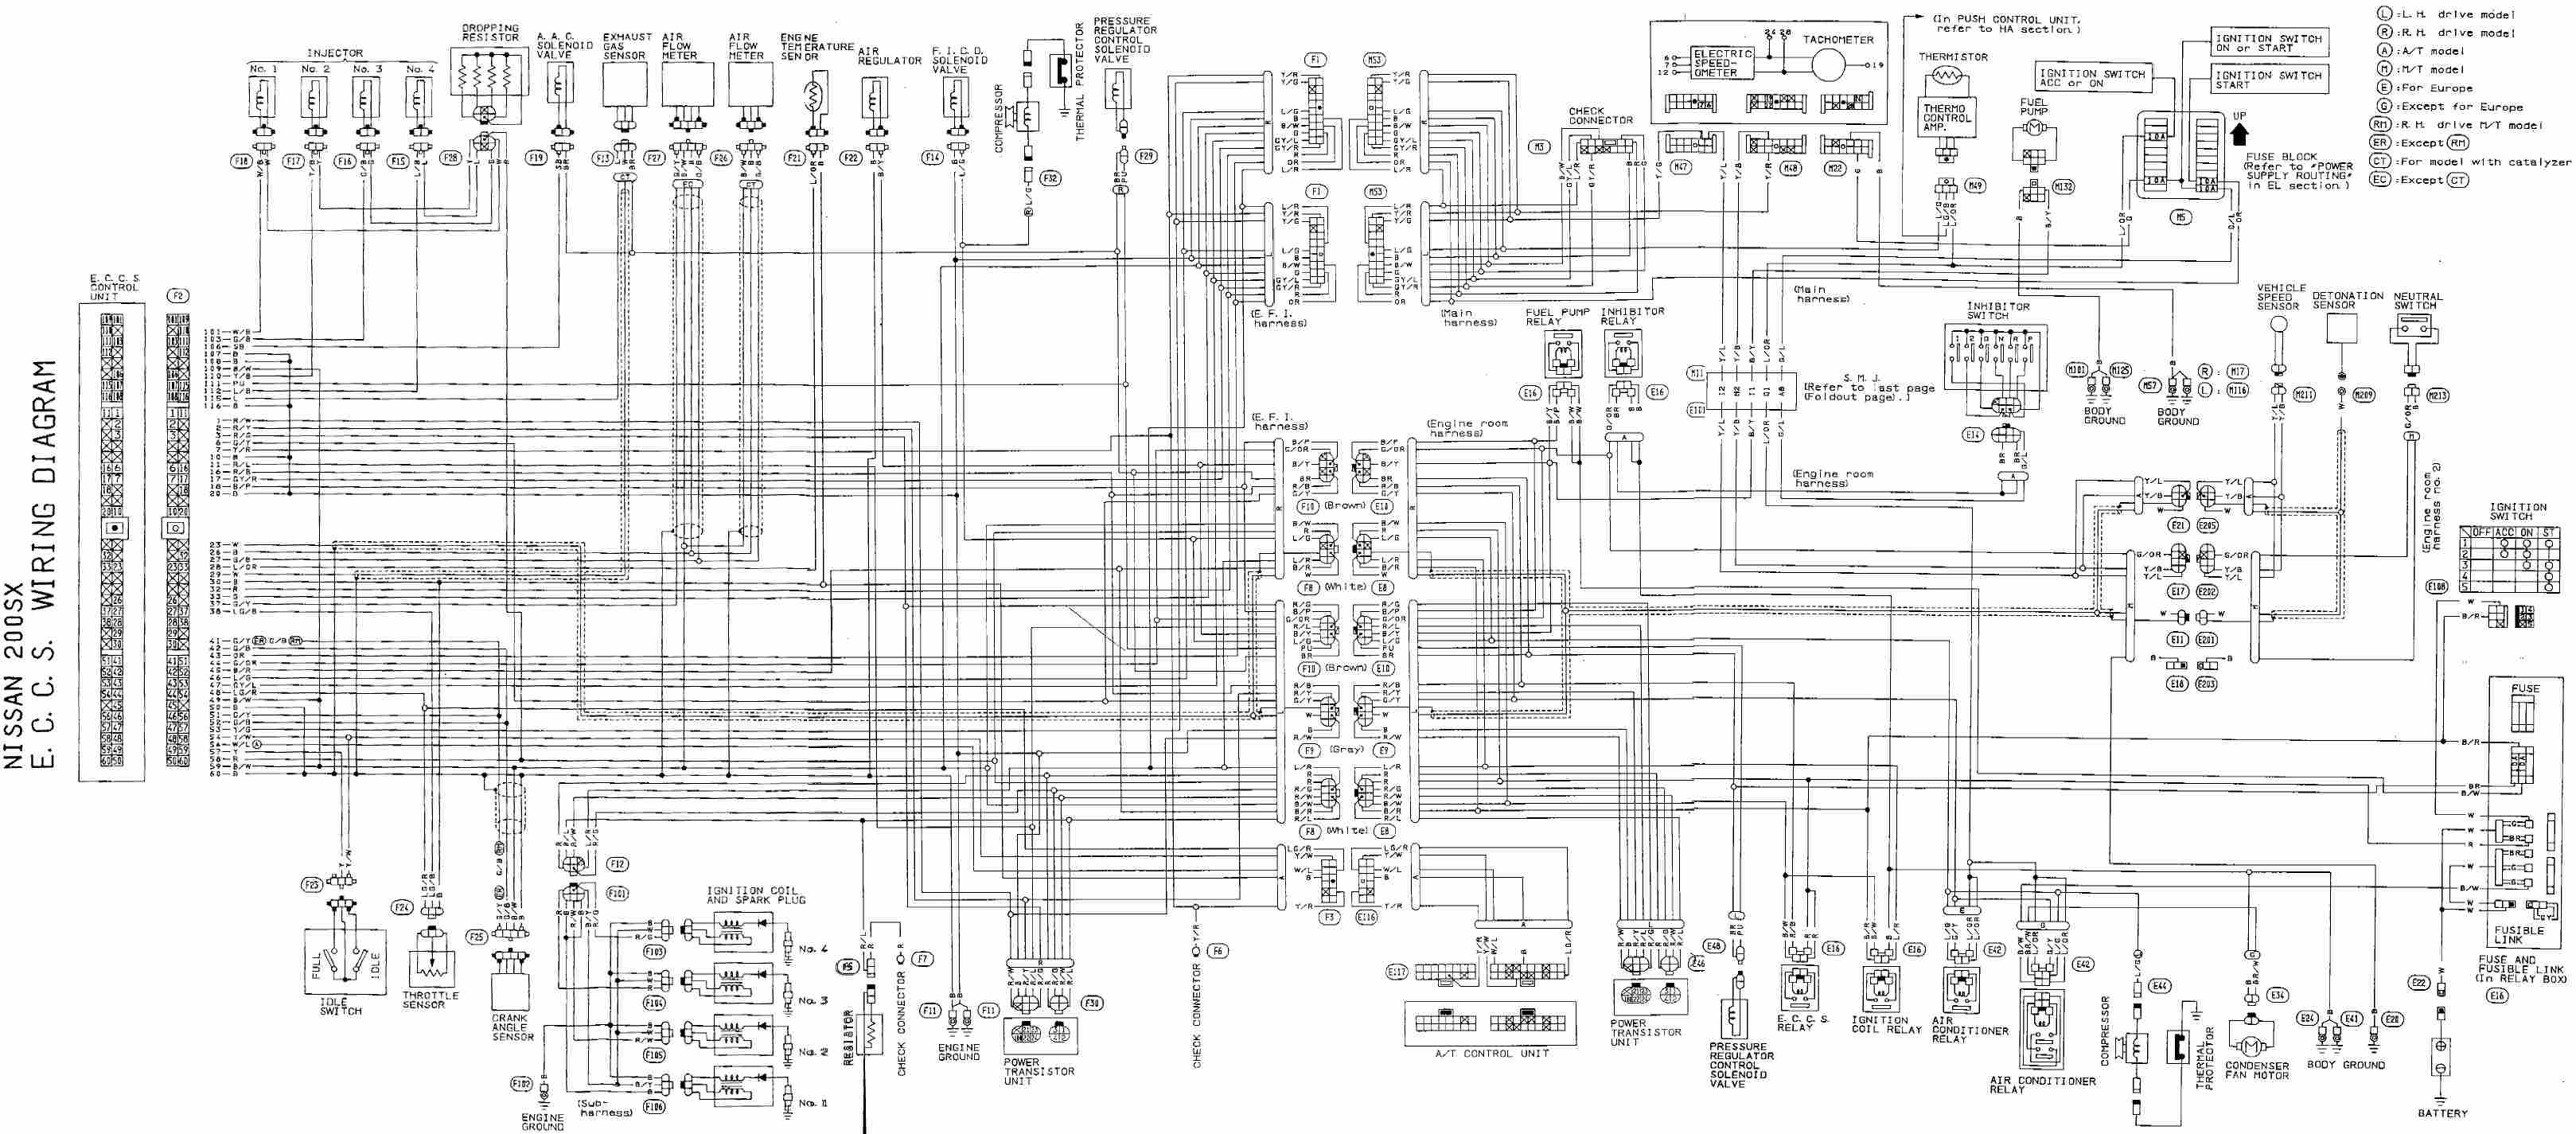 Repair Guides Wiring Diagrams AutoZone Entrancing Nissan afif